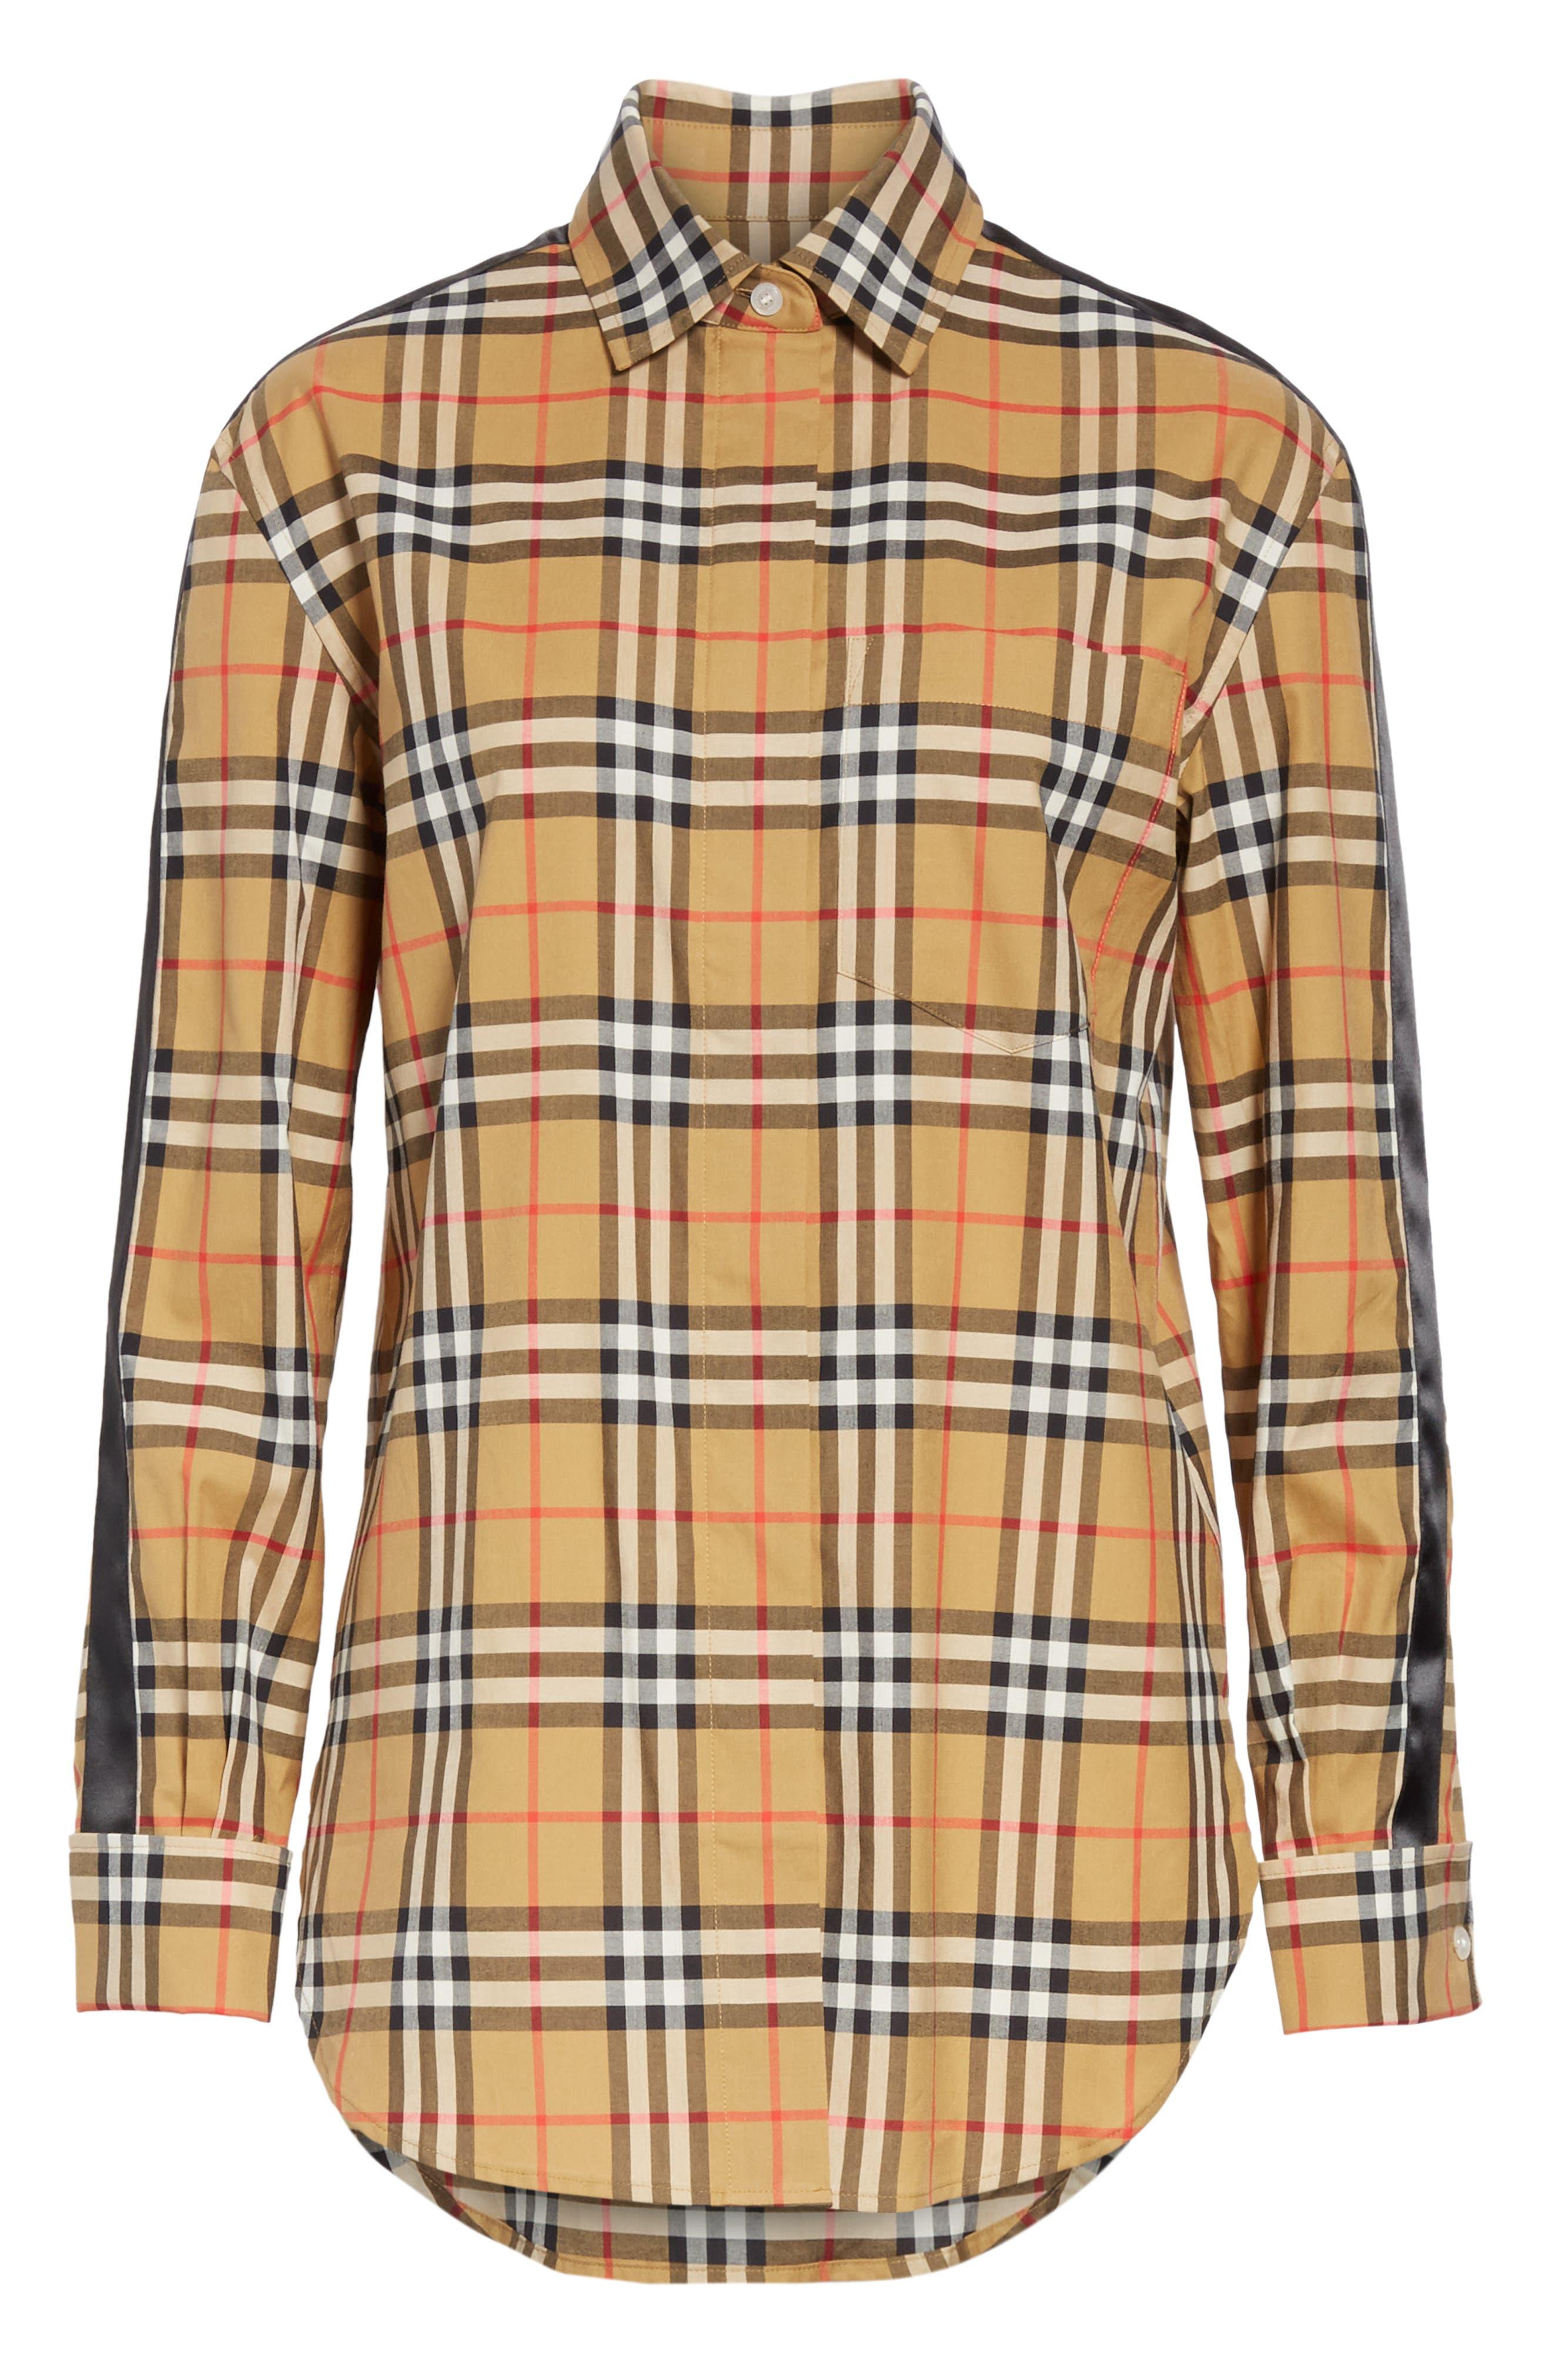 BURBERRY, Saoirse Vintage Check Cotton Shirt, Alternate thumbnail 7, color, ANTIQUE YELLOW CHECK